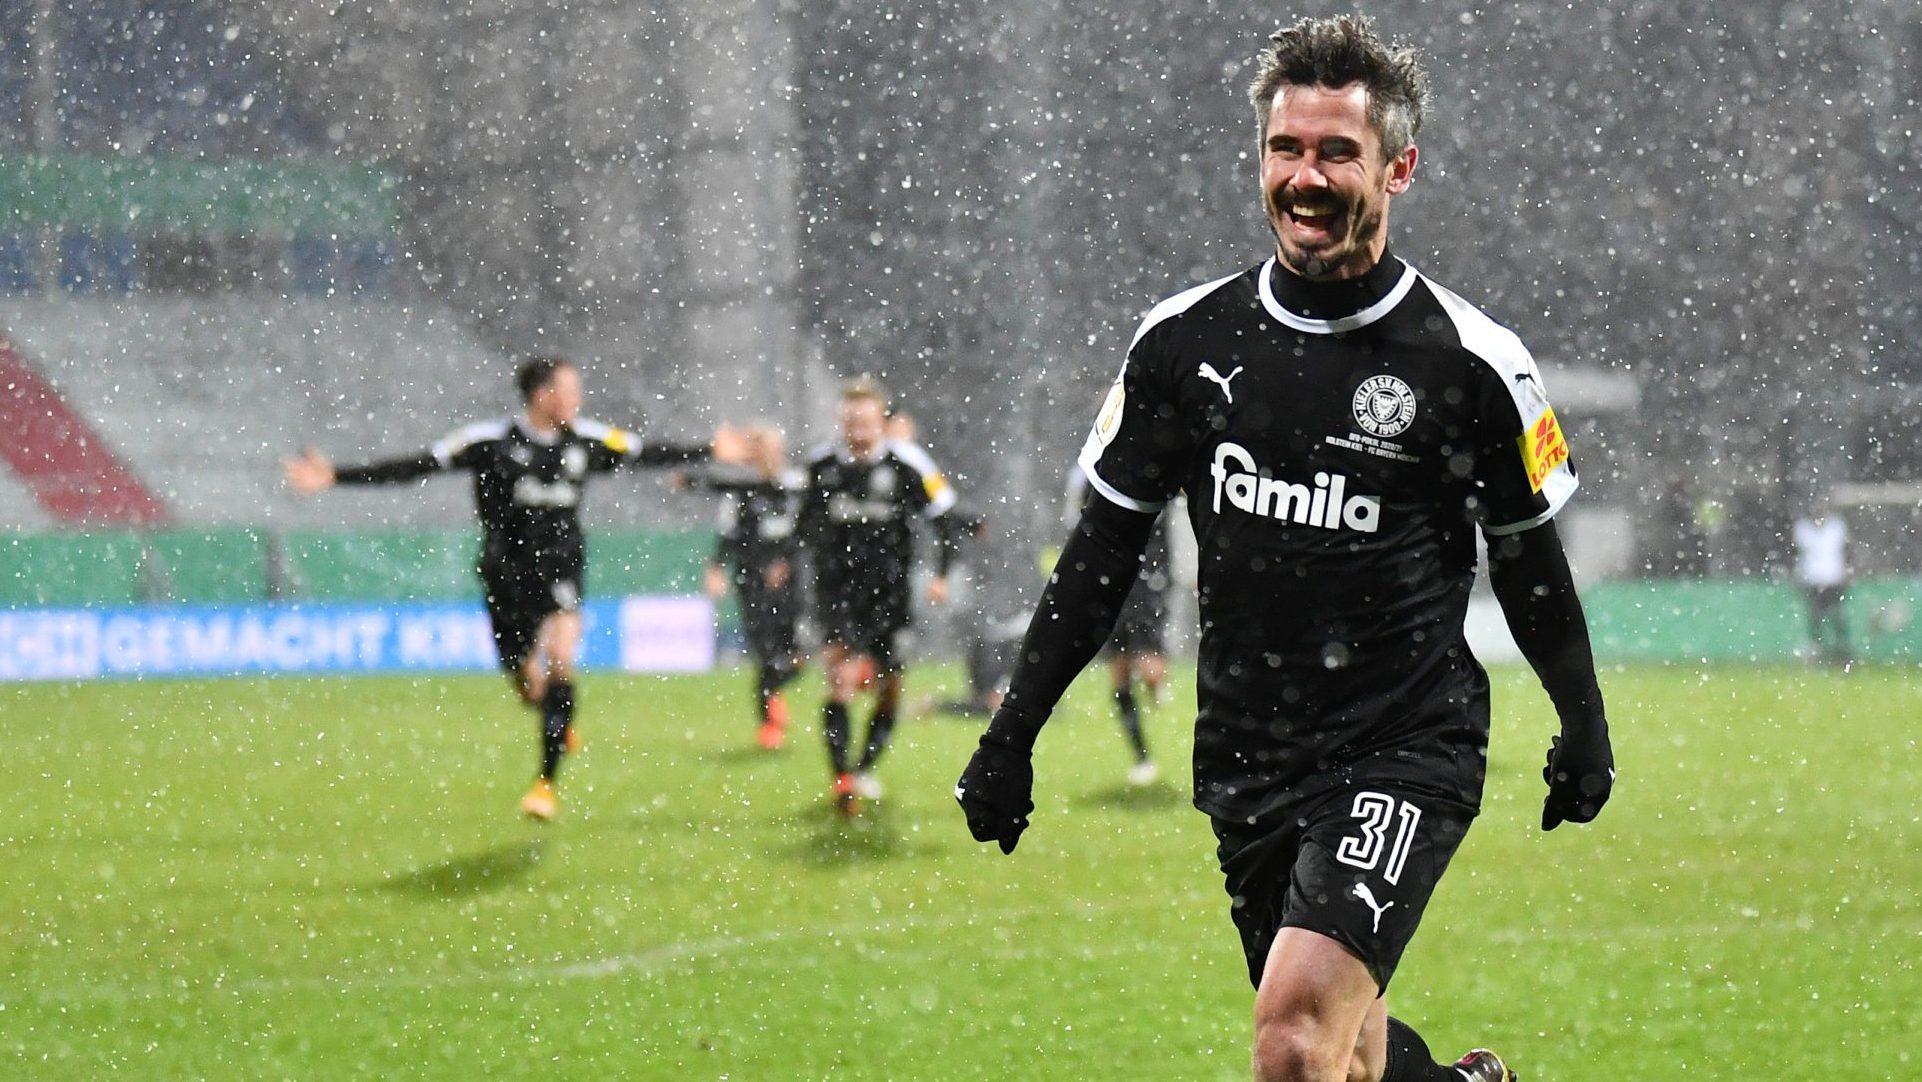 https www bundesliga com en bundesliga news holstein kiel bayern munich dfb cup live line ups stats lewandowski davies 14237